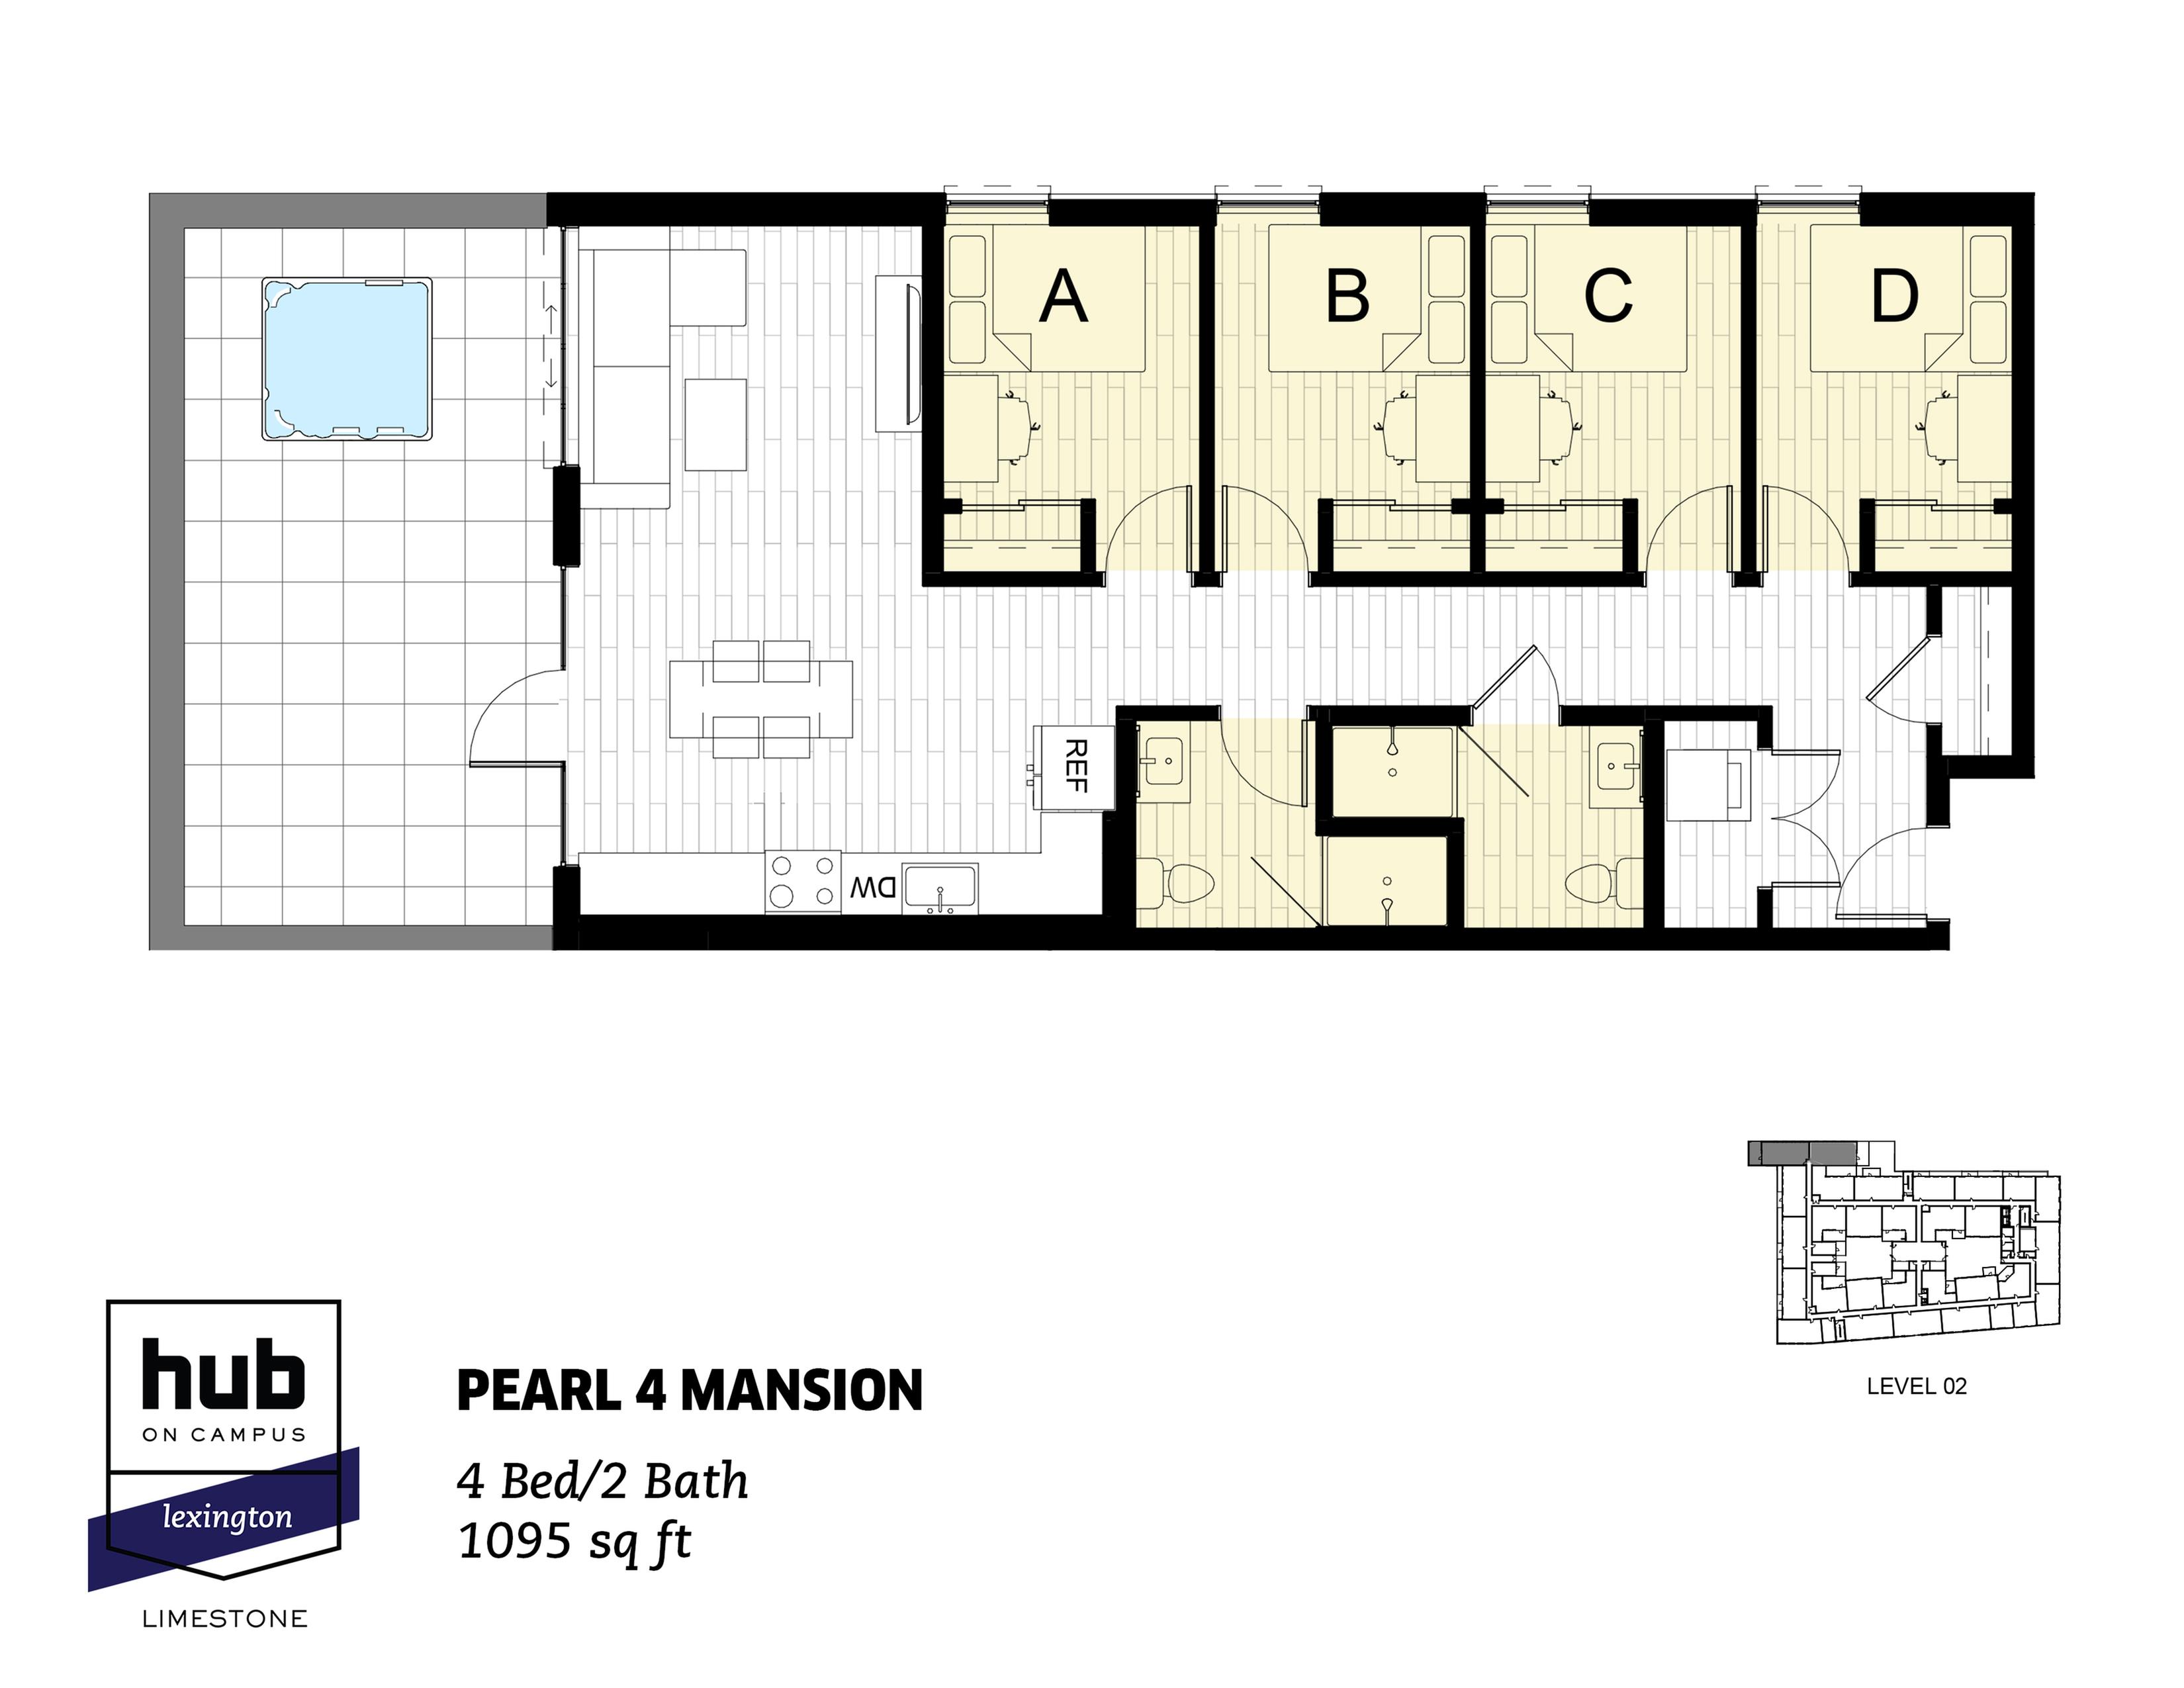 Pearl 4 Mansion